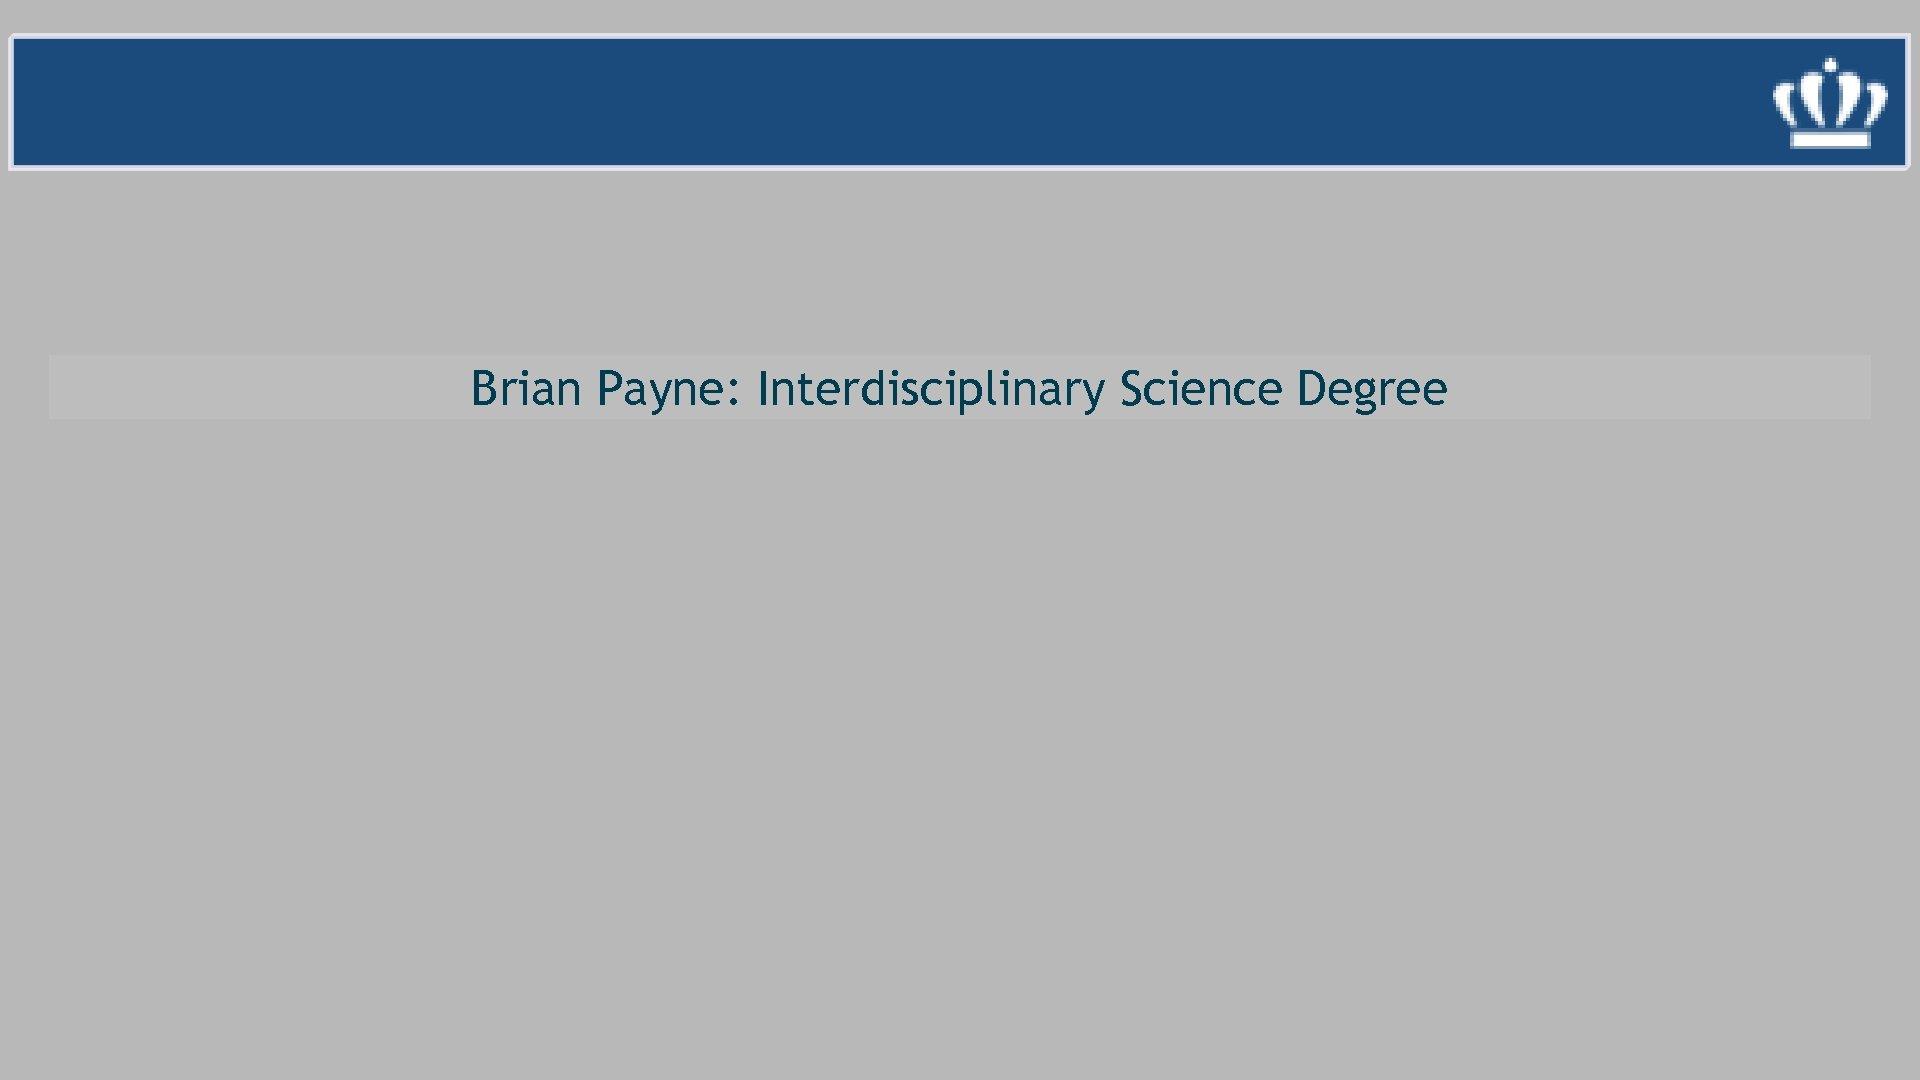 Brian Payne: Interdisciplinary Science Degree